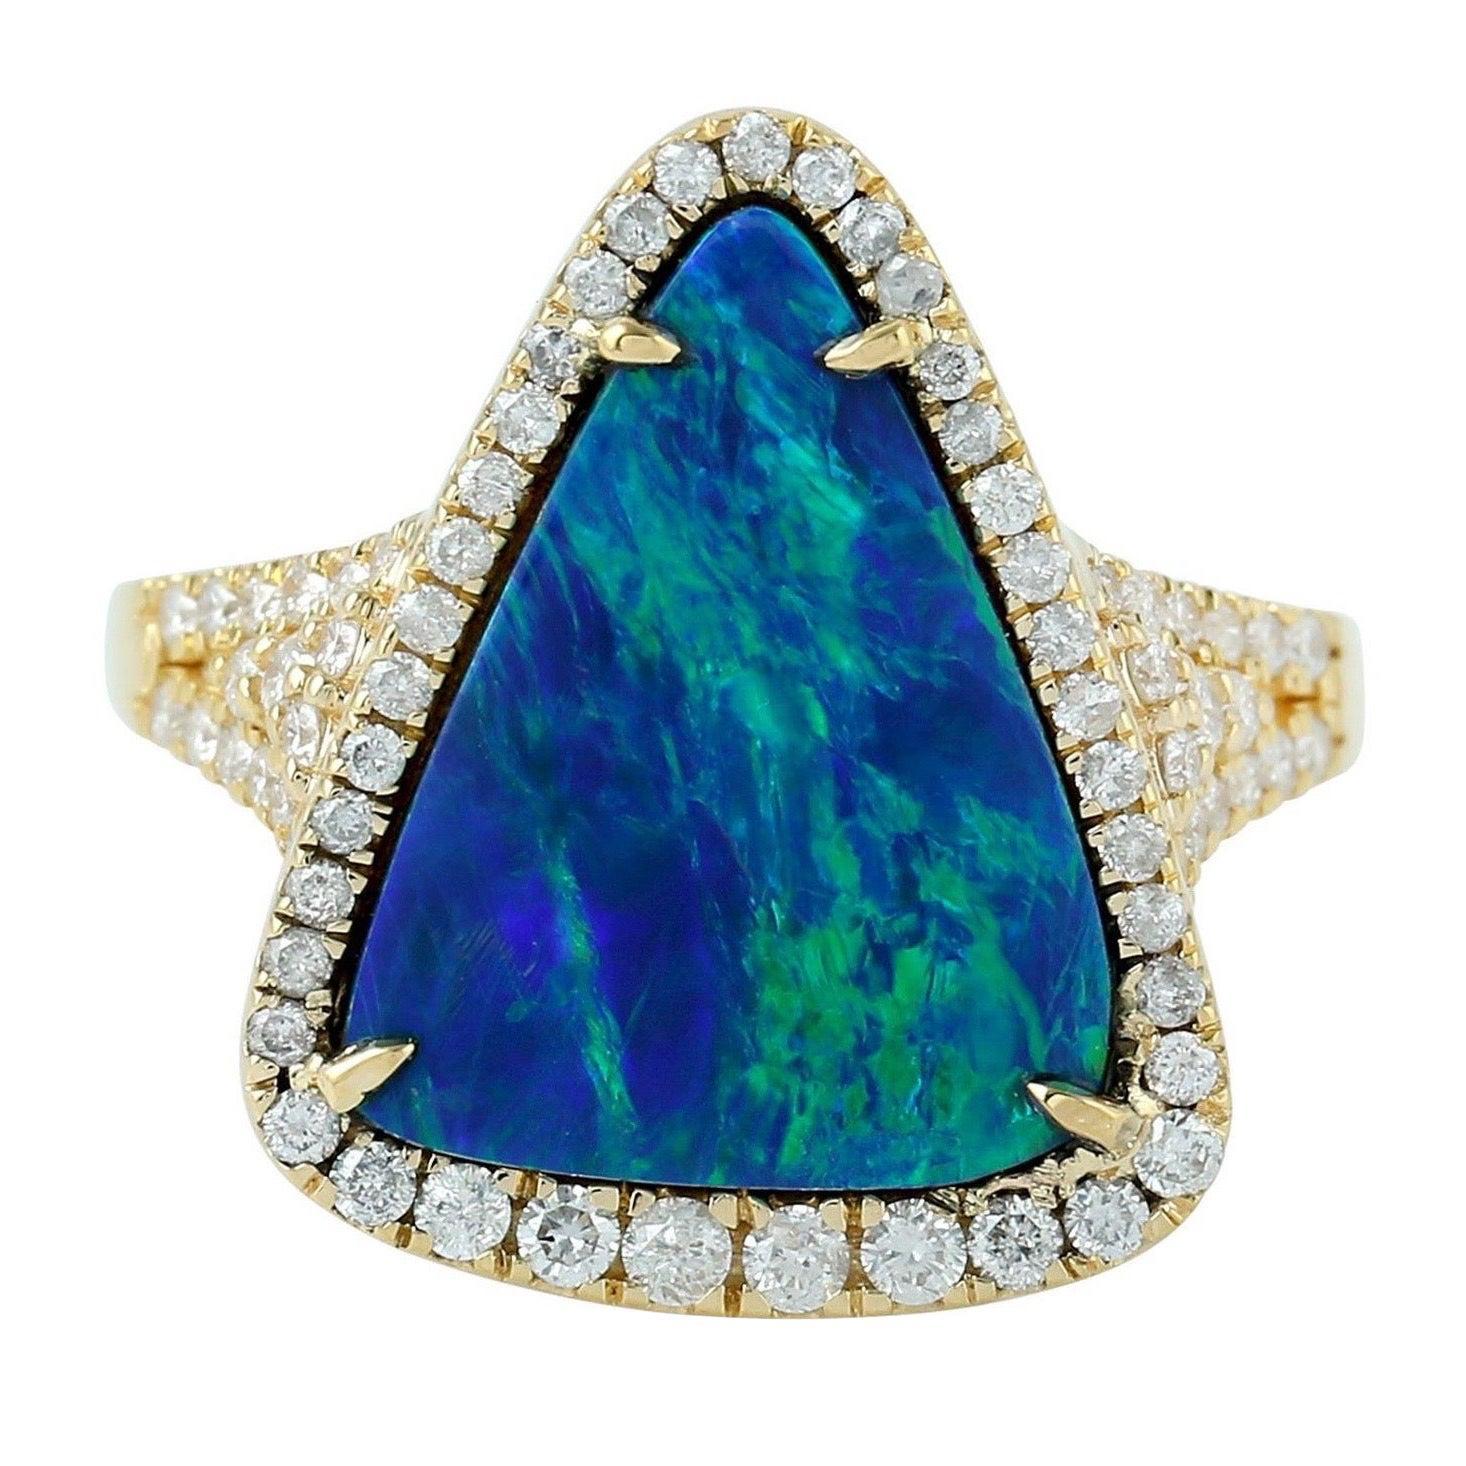 3.82 Carat Opal Diamond 18 Karat Gold Ring